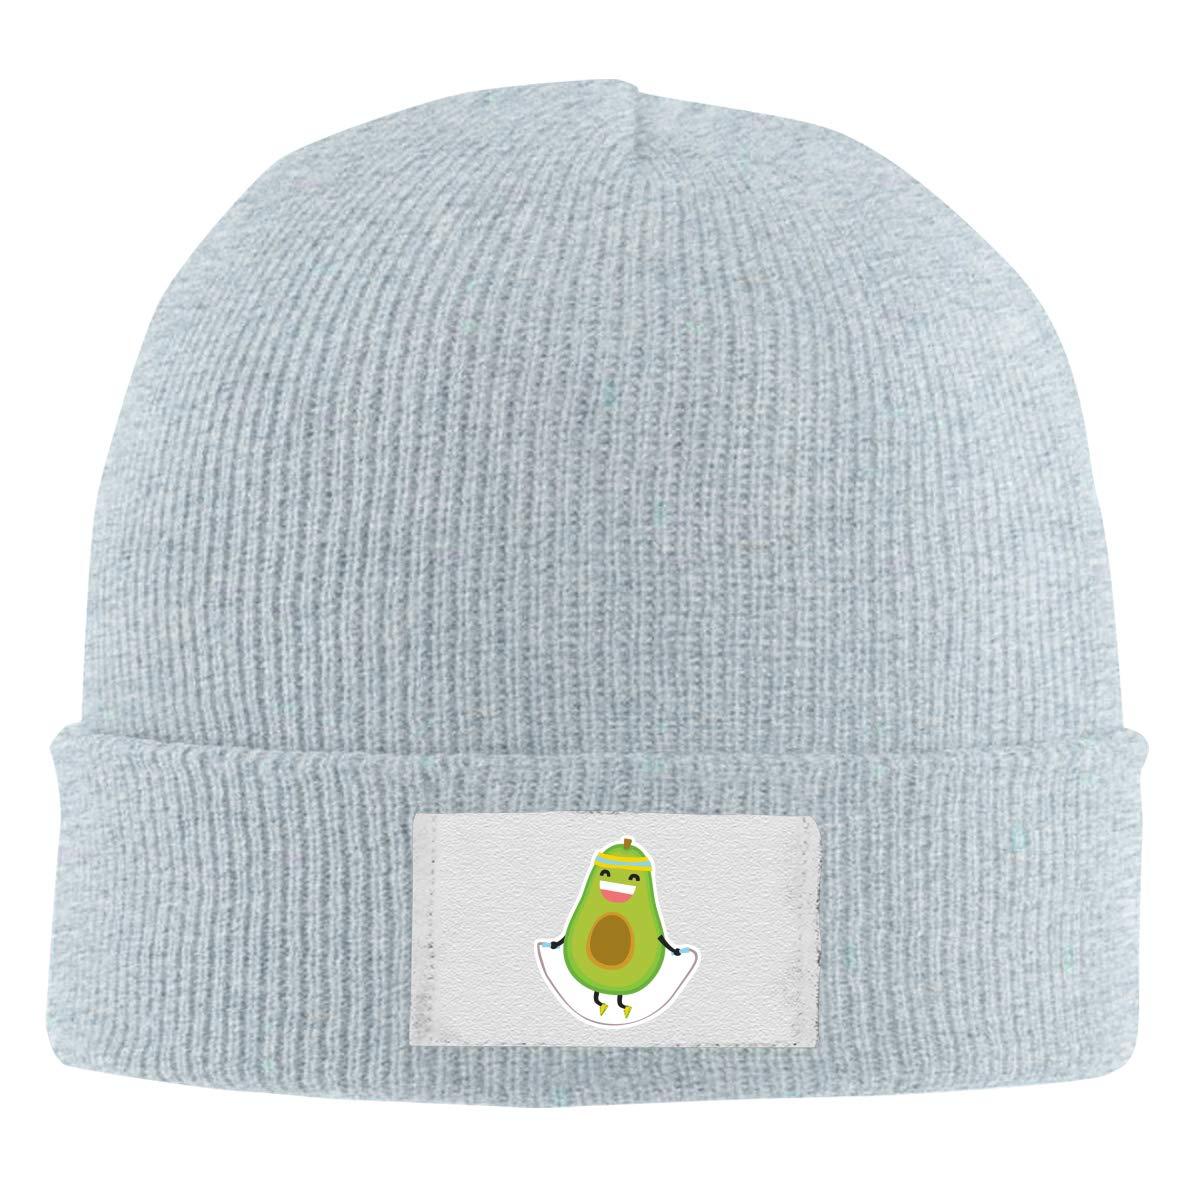 Stretchy Cuff Beanie Hat Black Dunpaiaa Skull Caps Avocado Jumping Rope Winter Warm Knit Hats